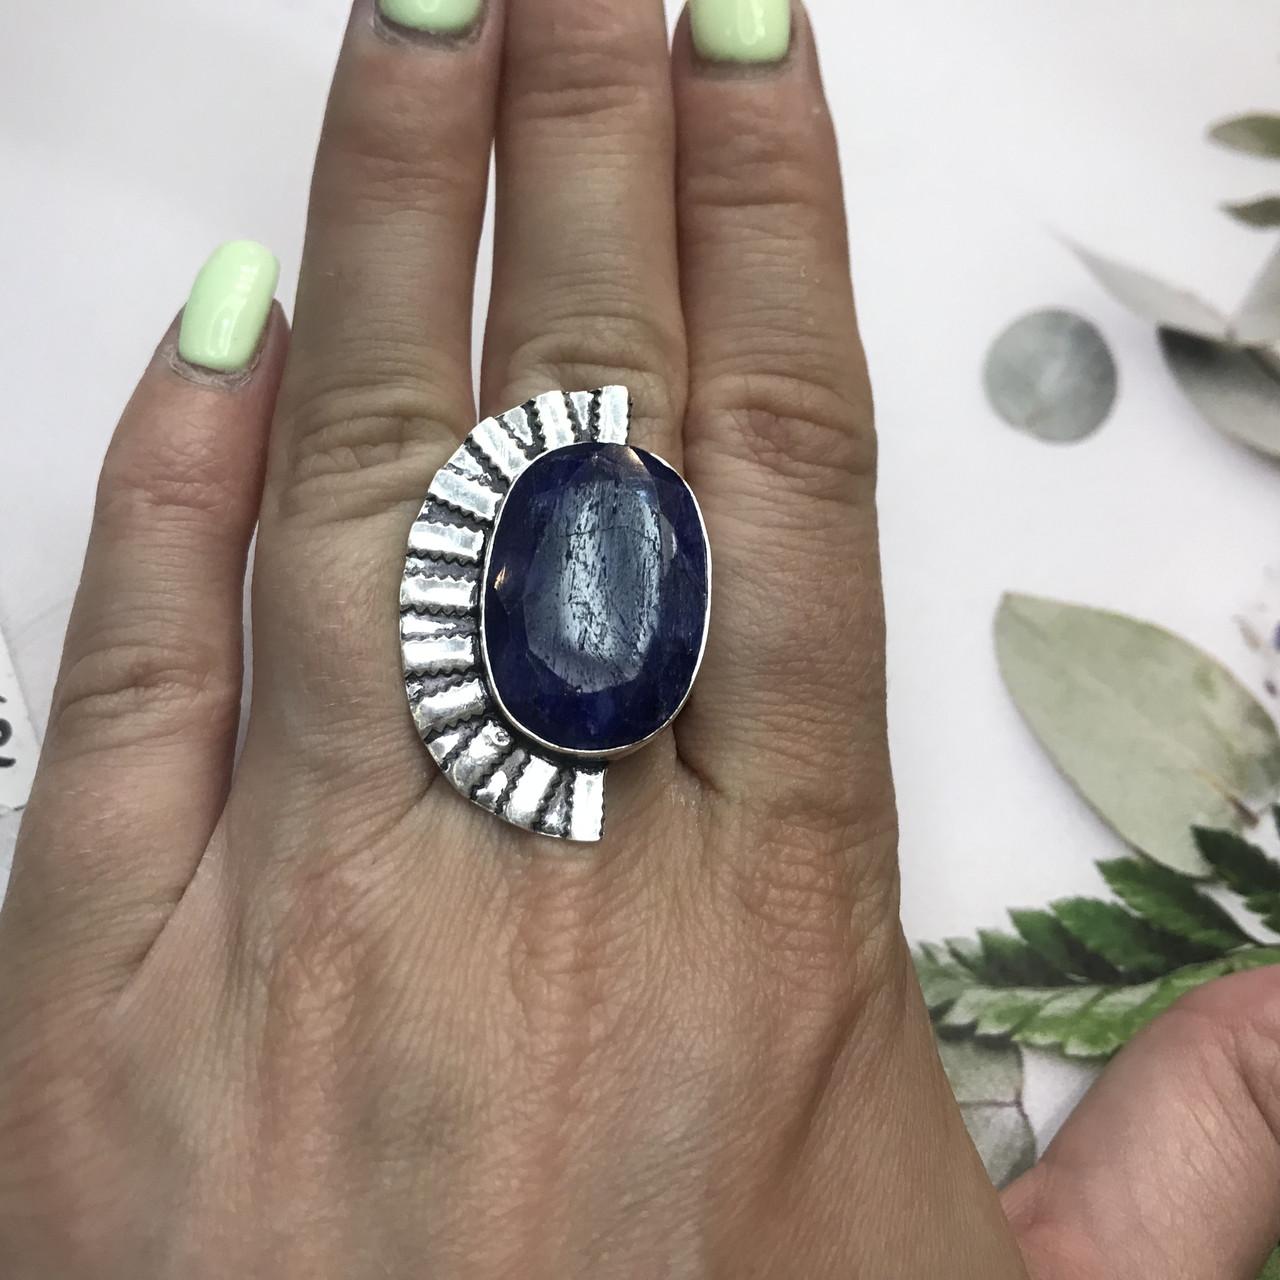 Сапфір кільце 18 розмір кільце з каменем натуральний сапфір в сріблі кільце з сапфіром.